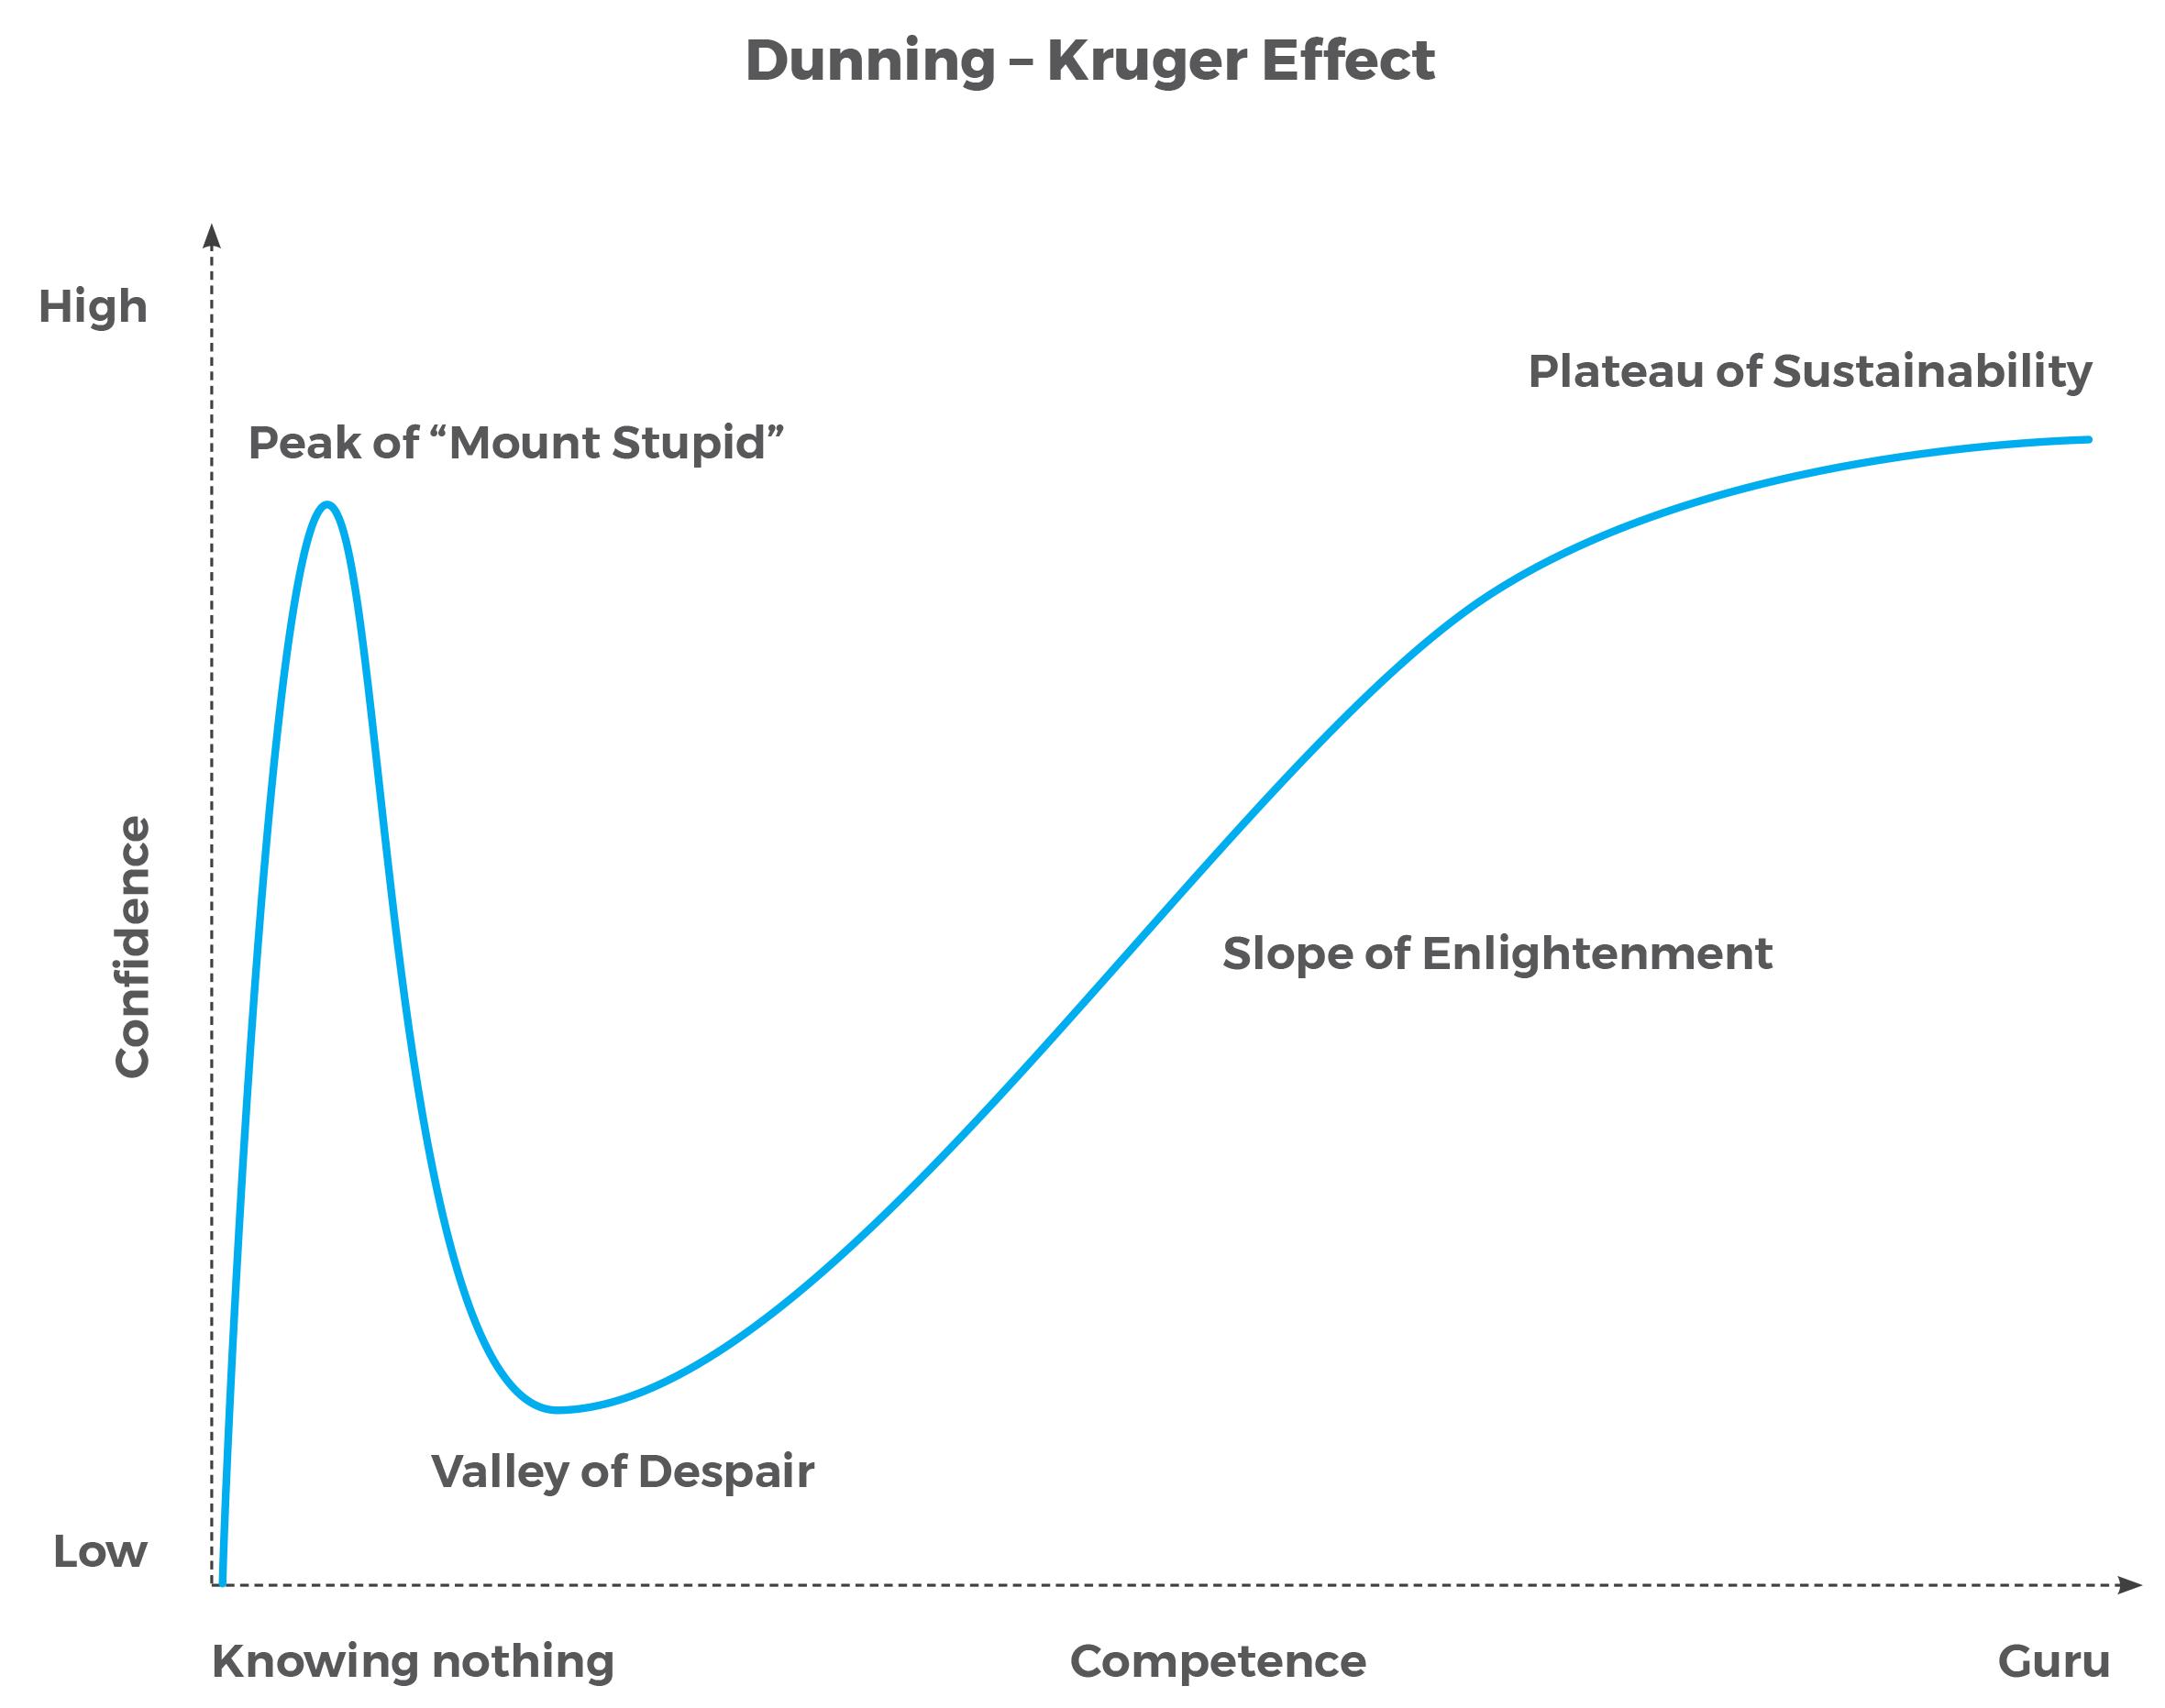 Graph showing Dunning-Kruger effect